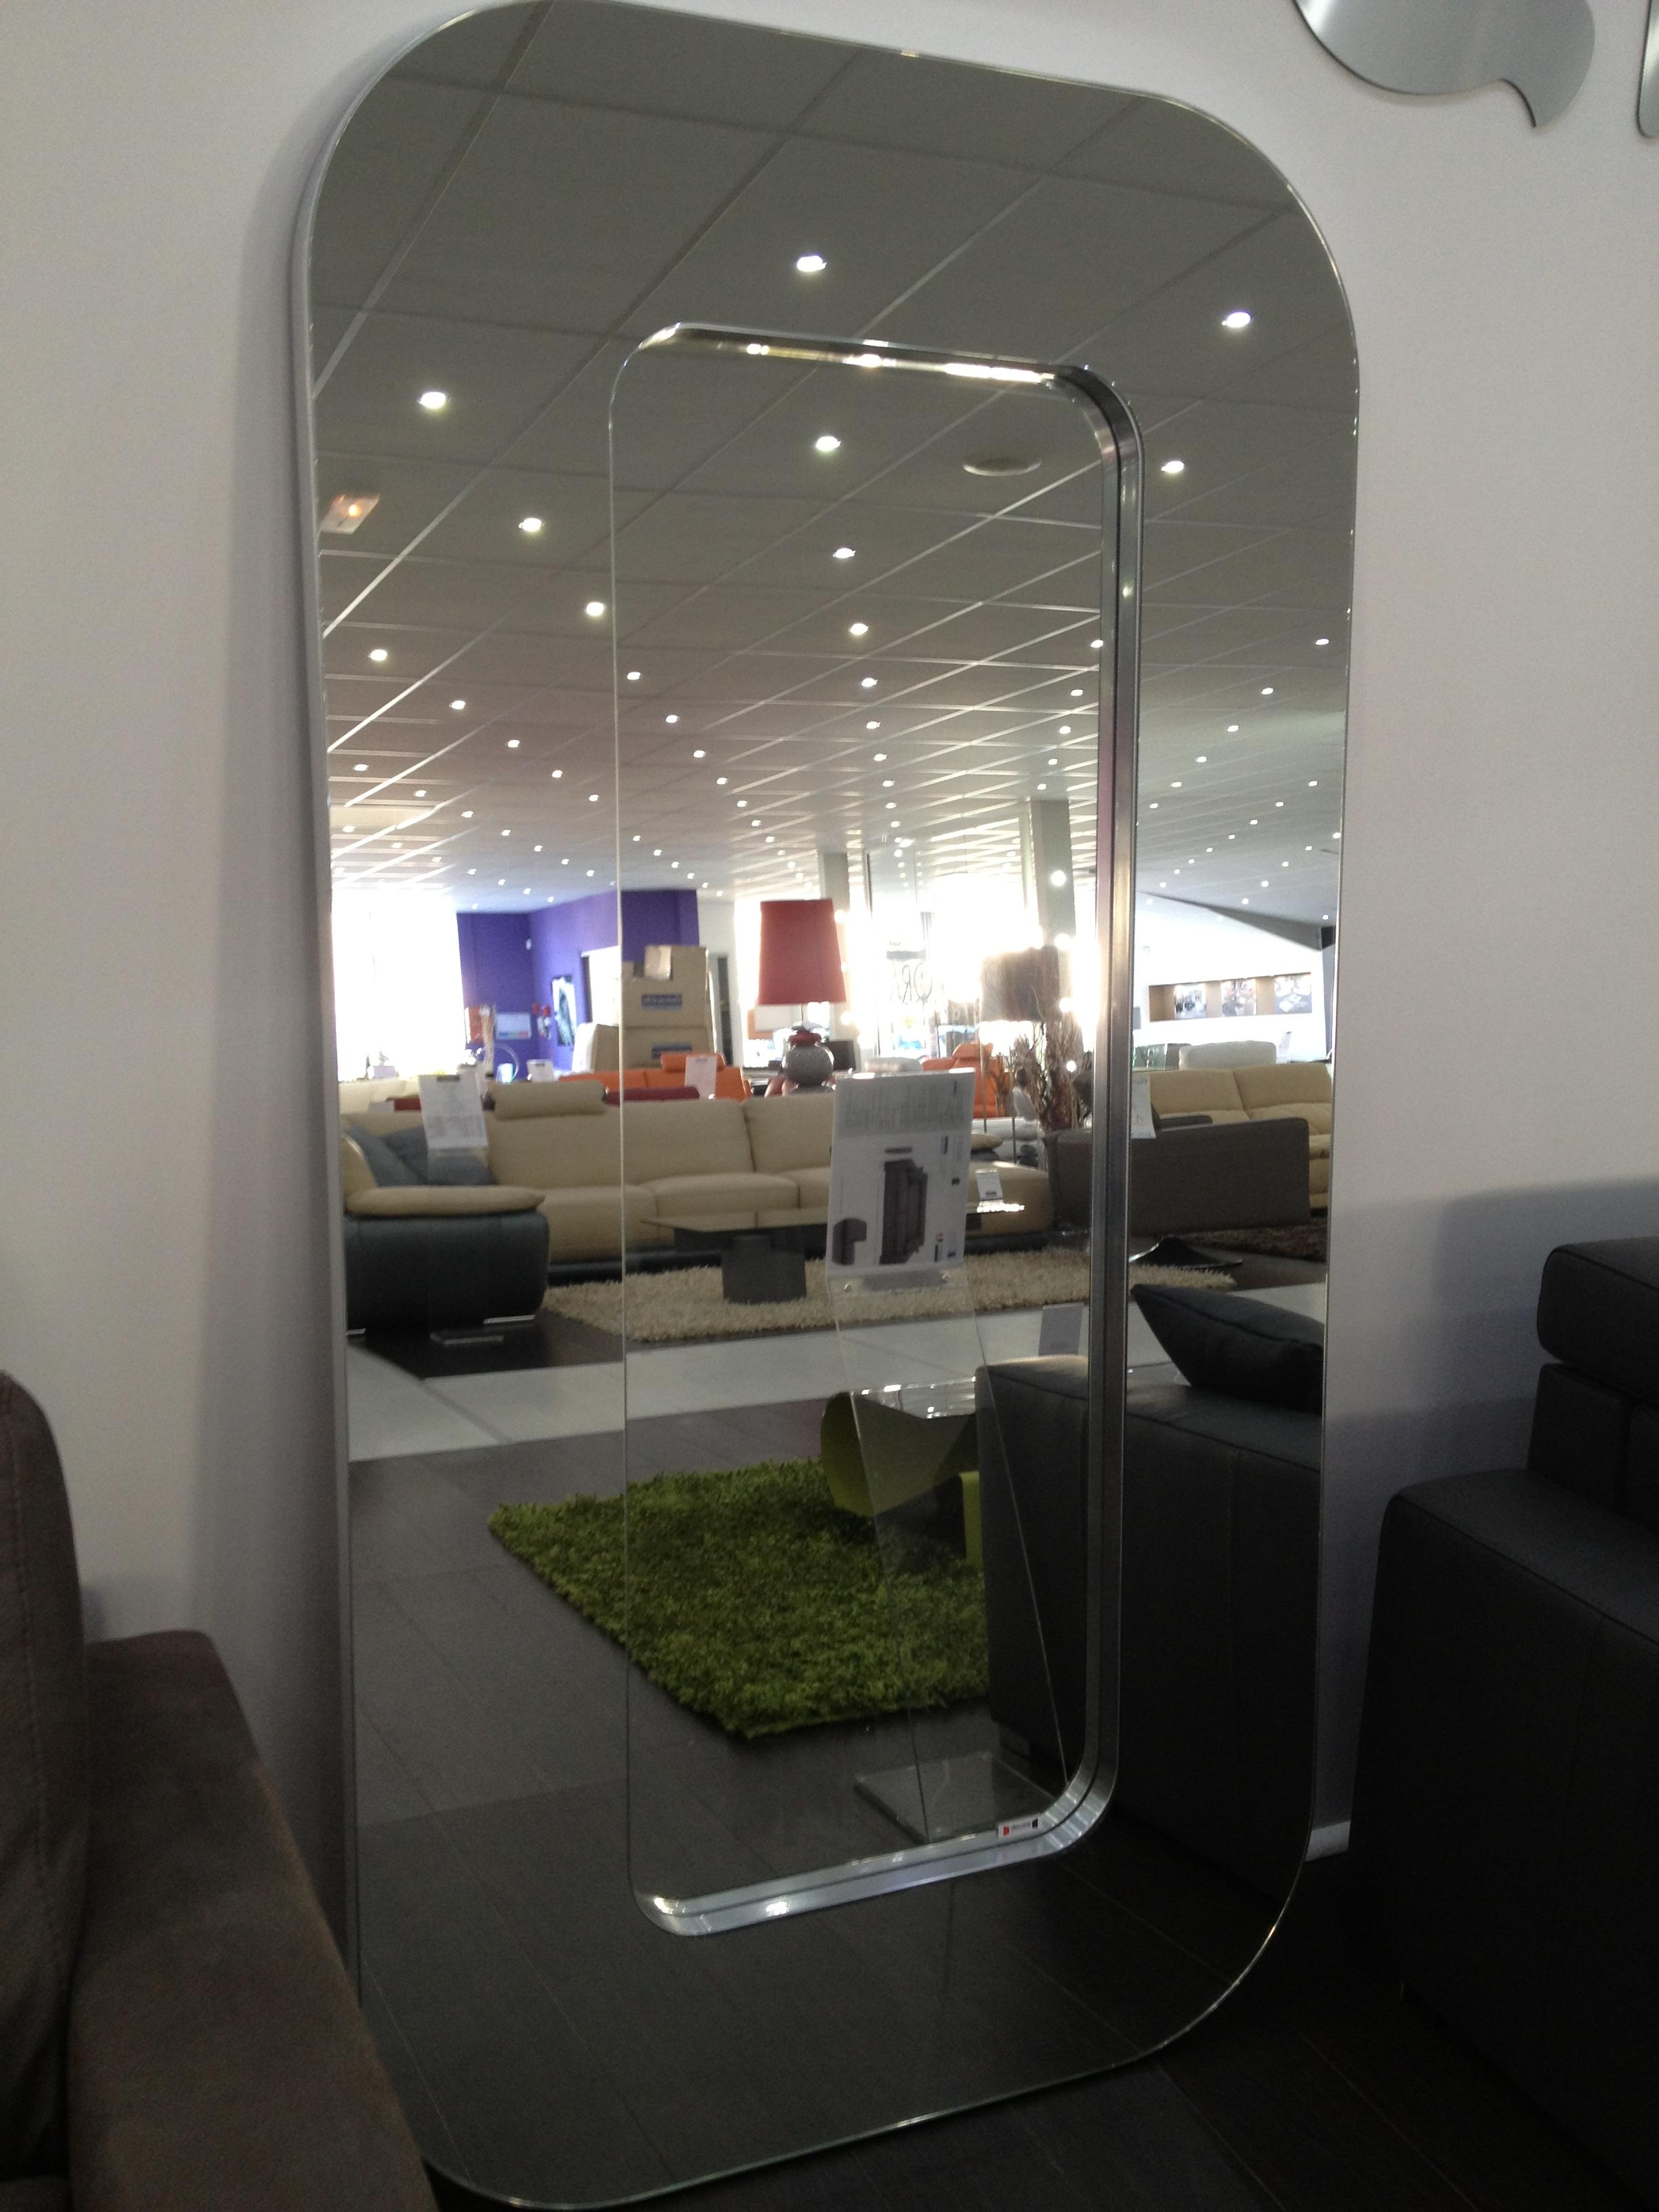 Miroir d co lounge xl chateau d 39 ax marseille 13 - Deco miroir muurschildering ...